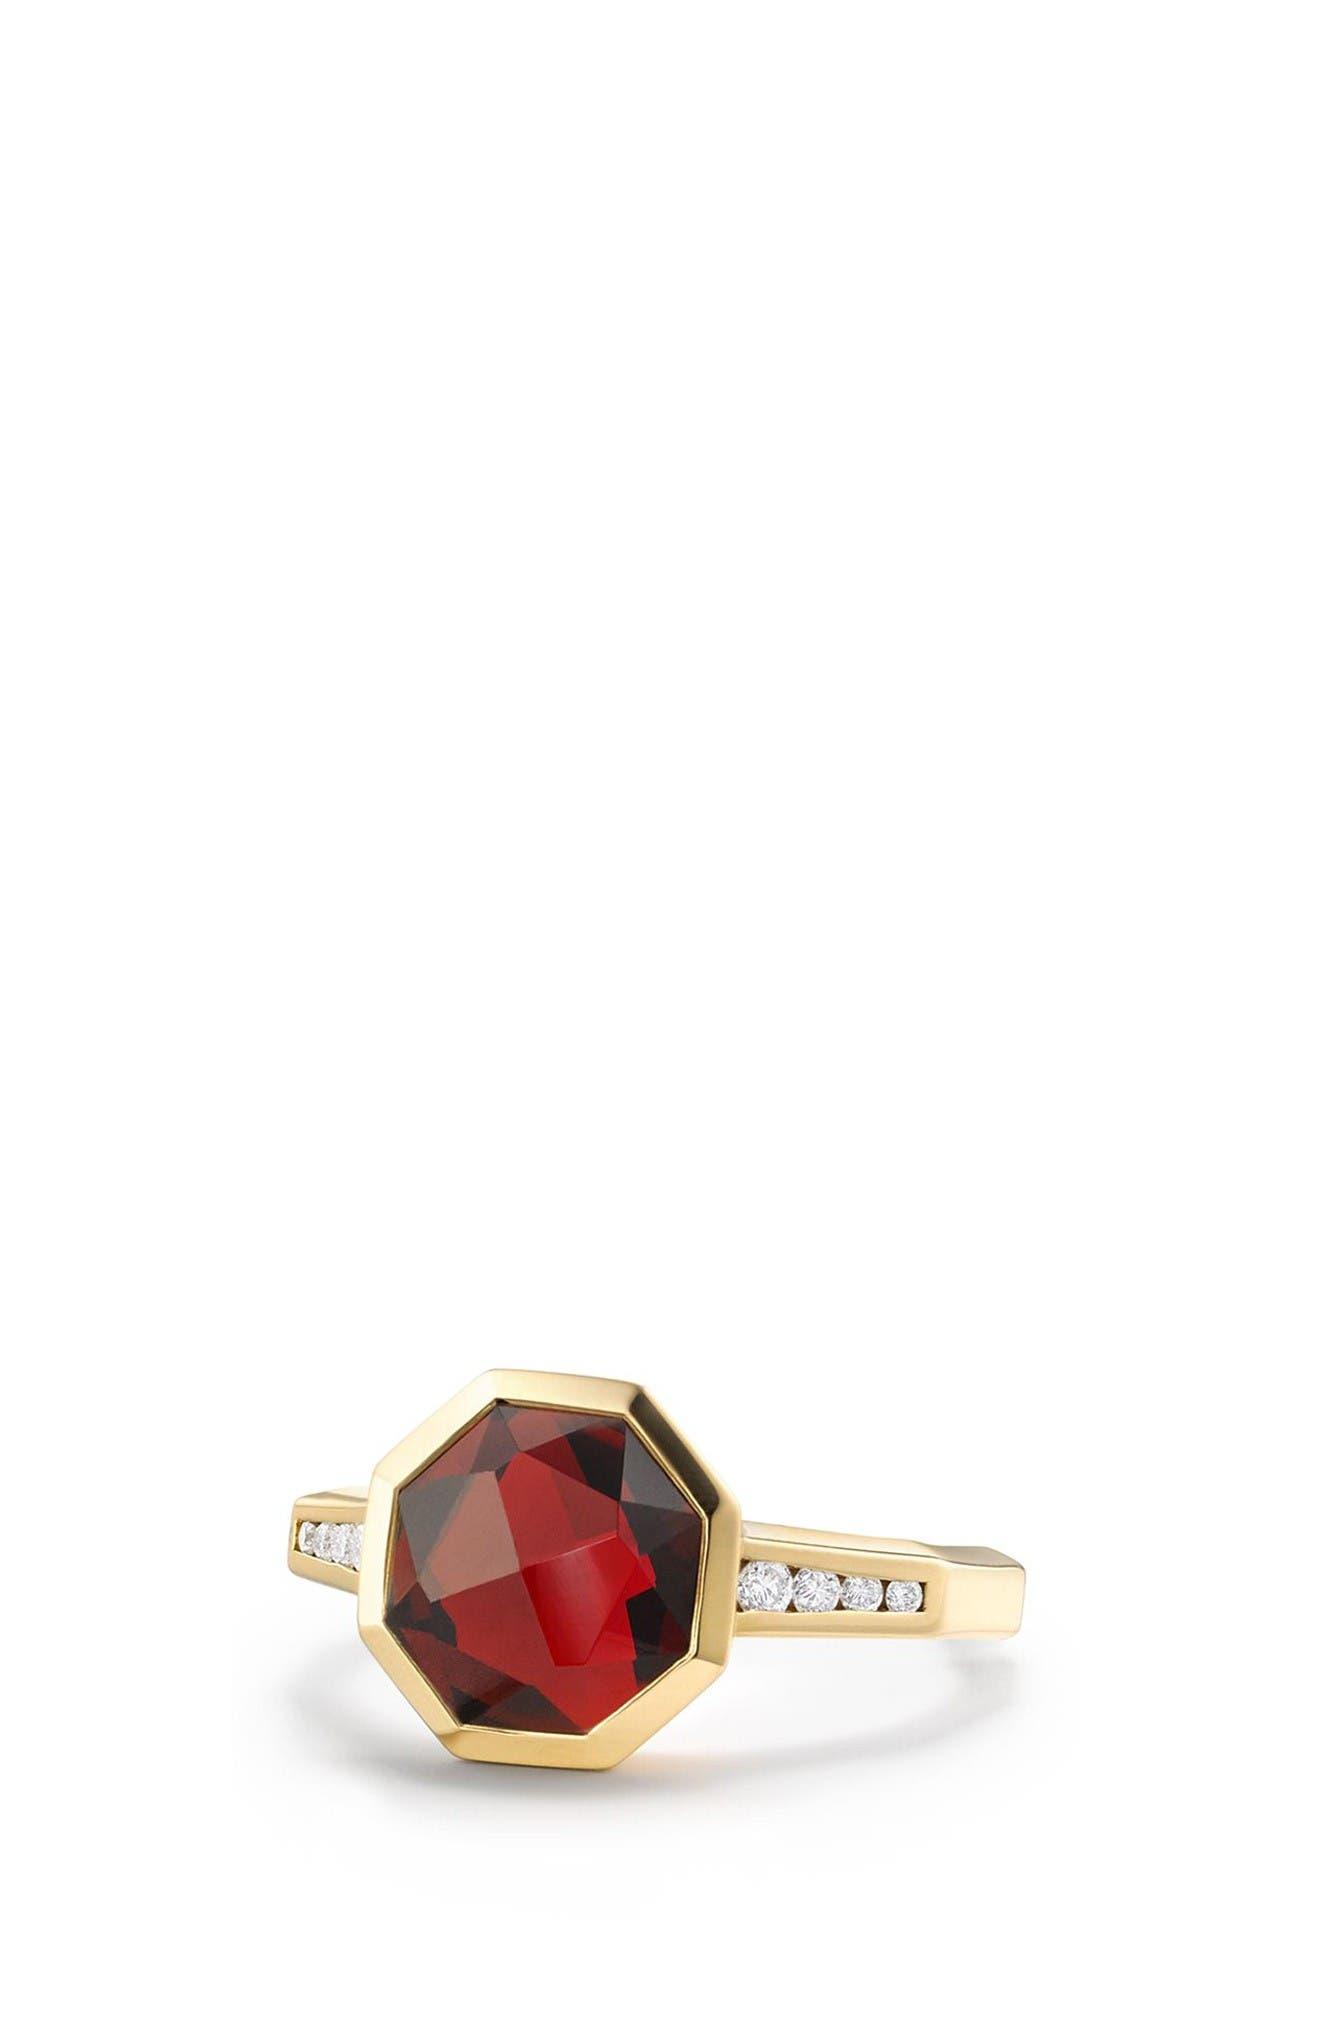 David Yurman Guilin Octagon Ring with Diamonds in 18K Gold